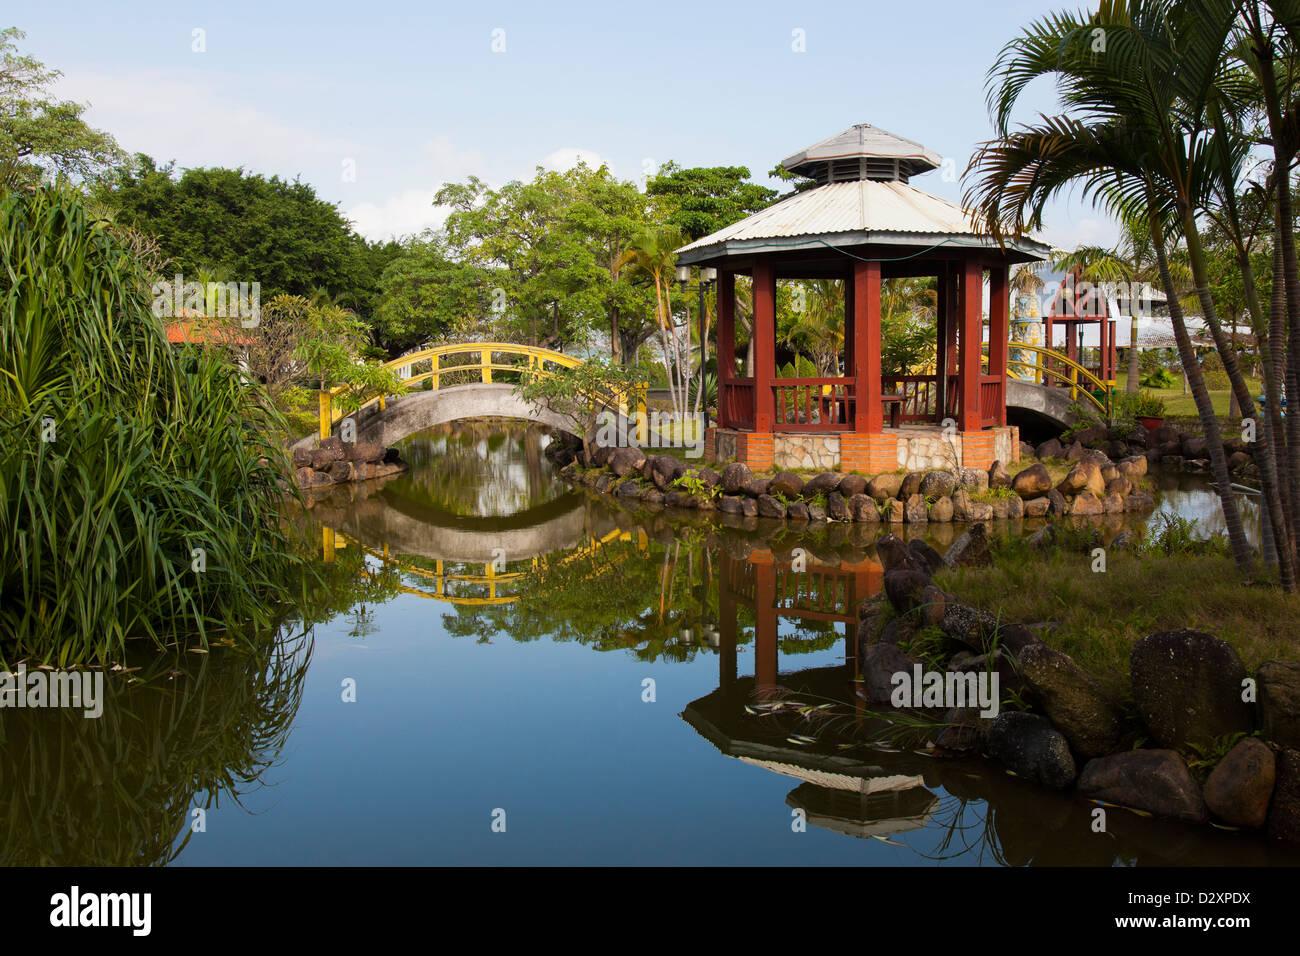 Japanese Garden in Ha Long, Quảng Ninh Province, Vietnam - Stock Image